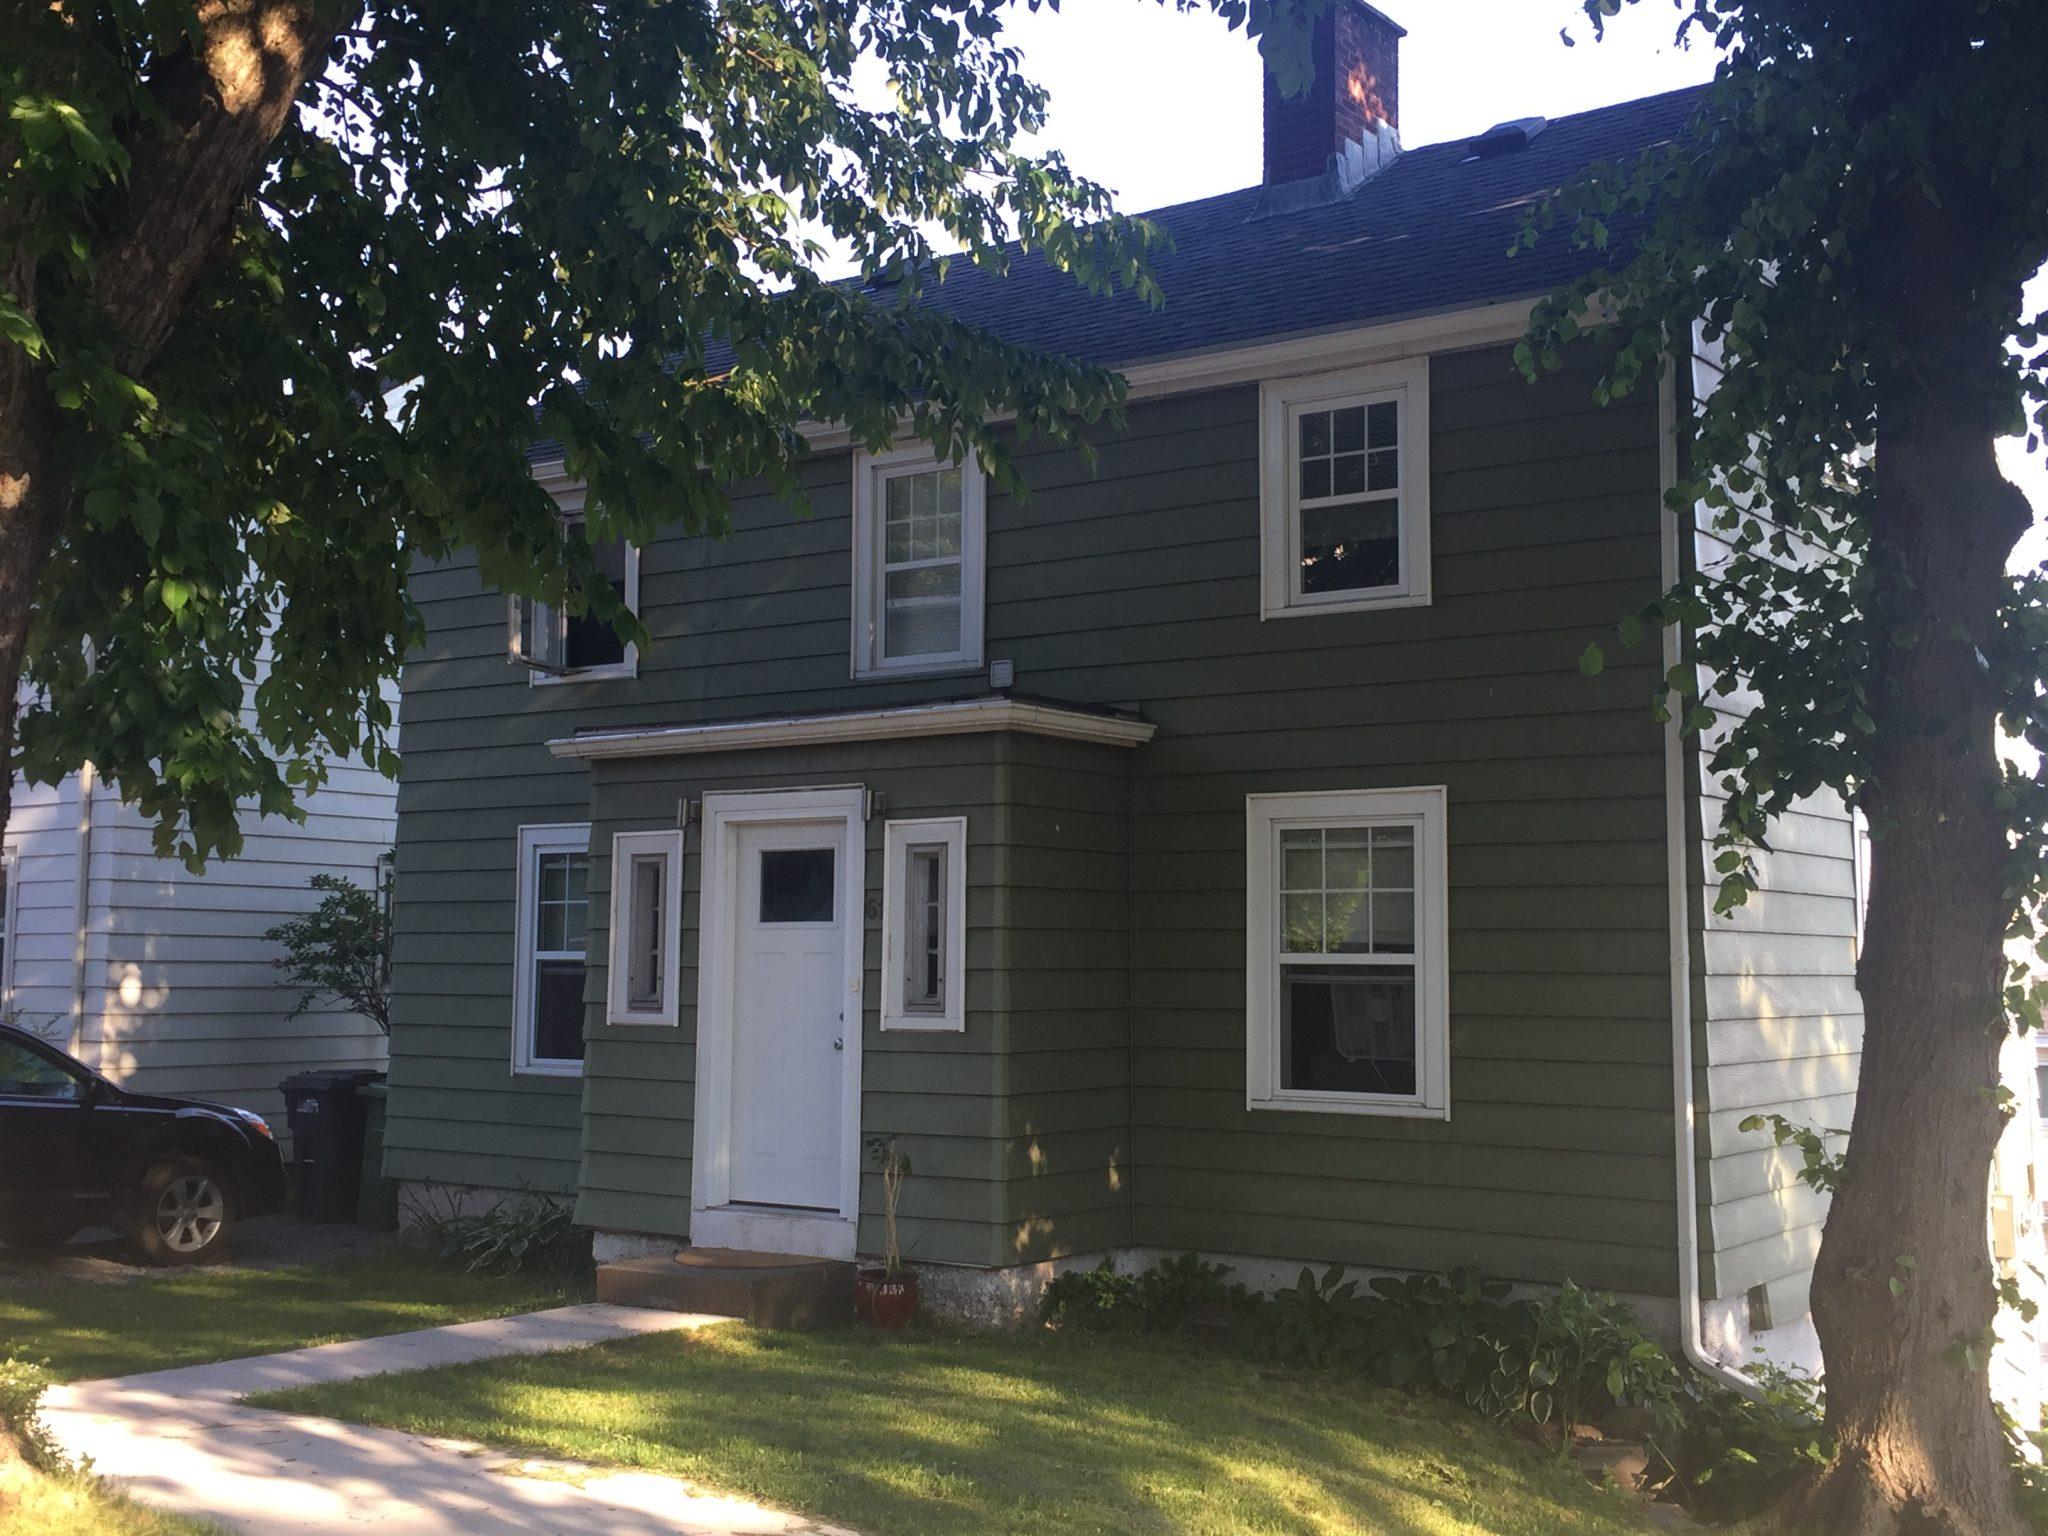 61 Fairbanks Street Dartmouth Ns B3a 1c2 Ansell